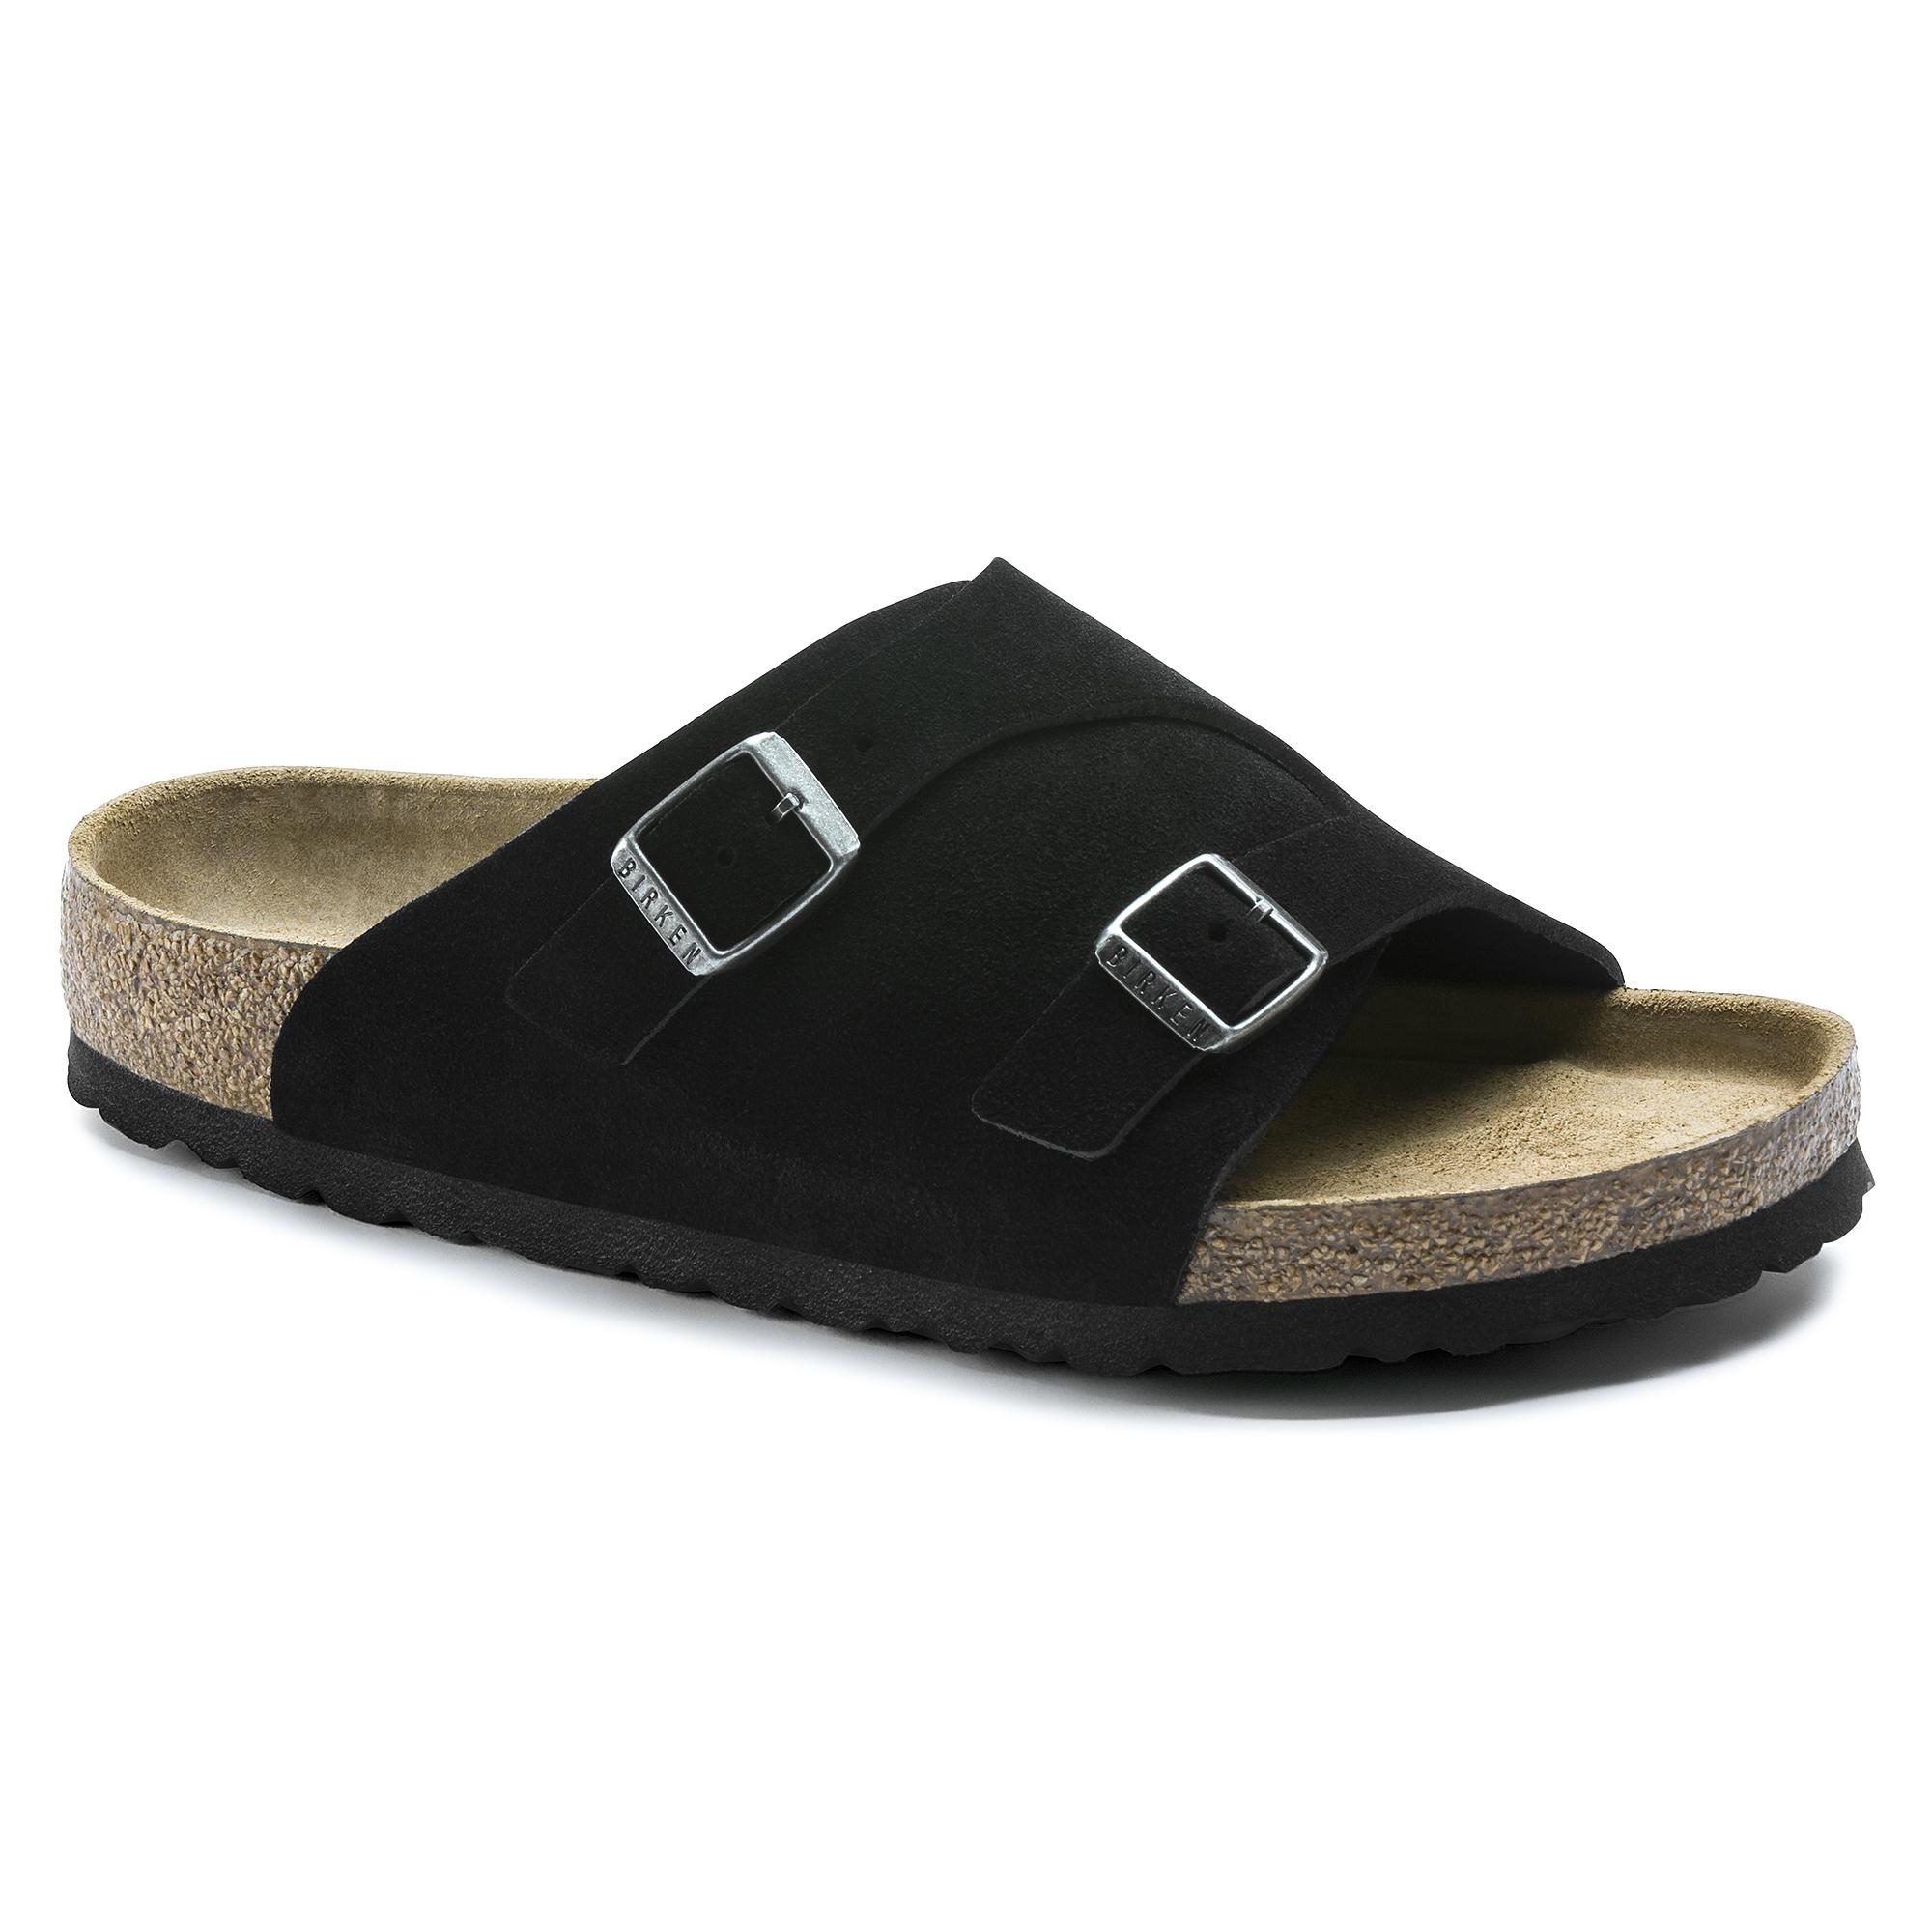 c759b298ff0e Zürich Suede Leather Soft Footbed Black ...